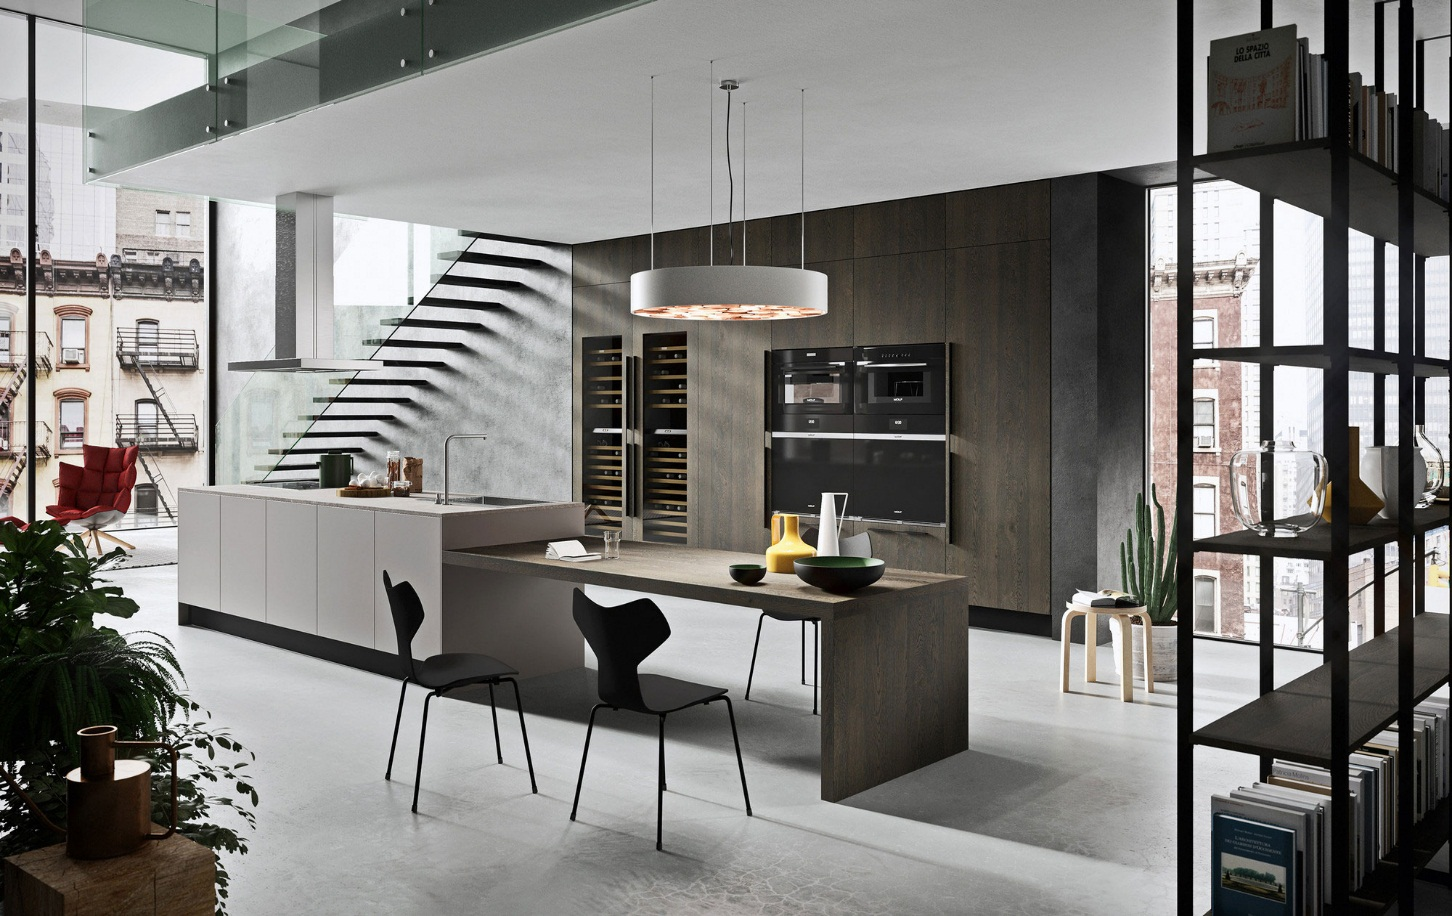 طراحی آشپزخانه مدرن 17